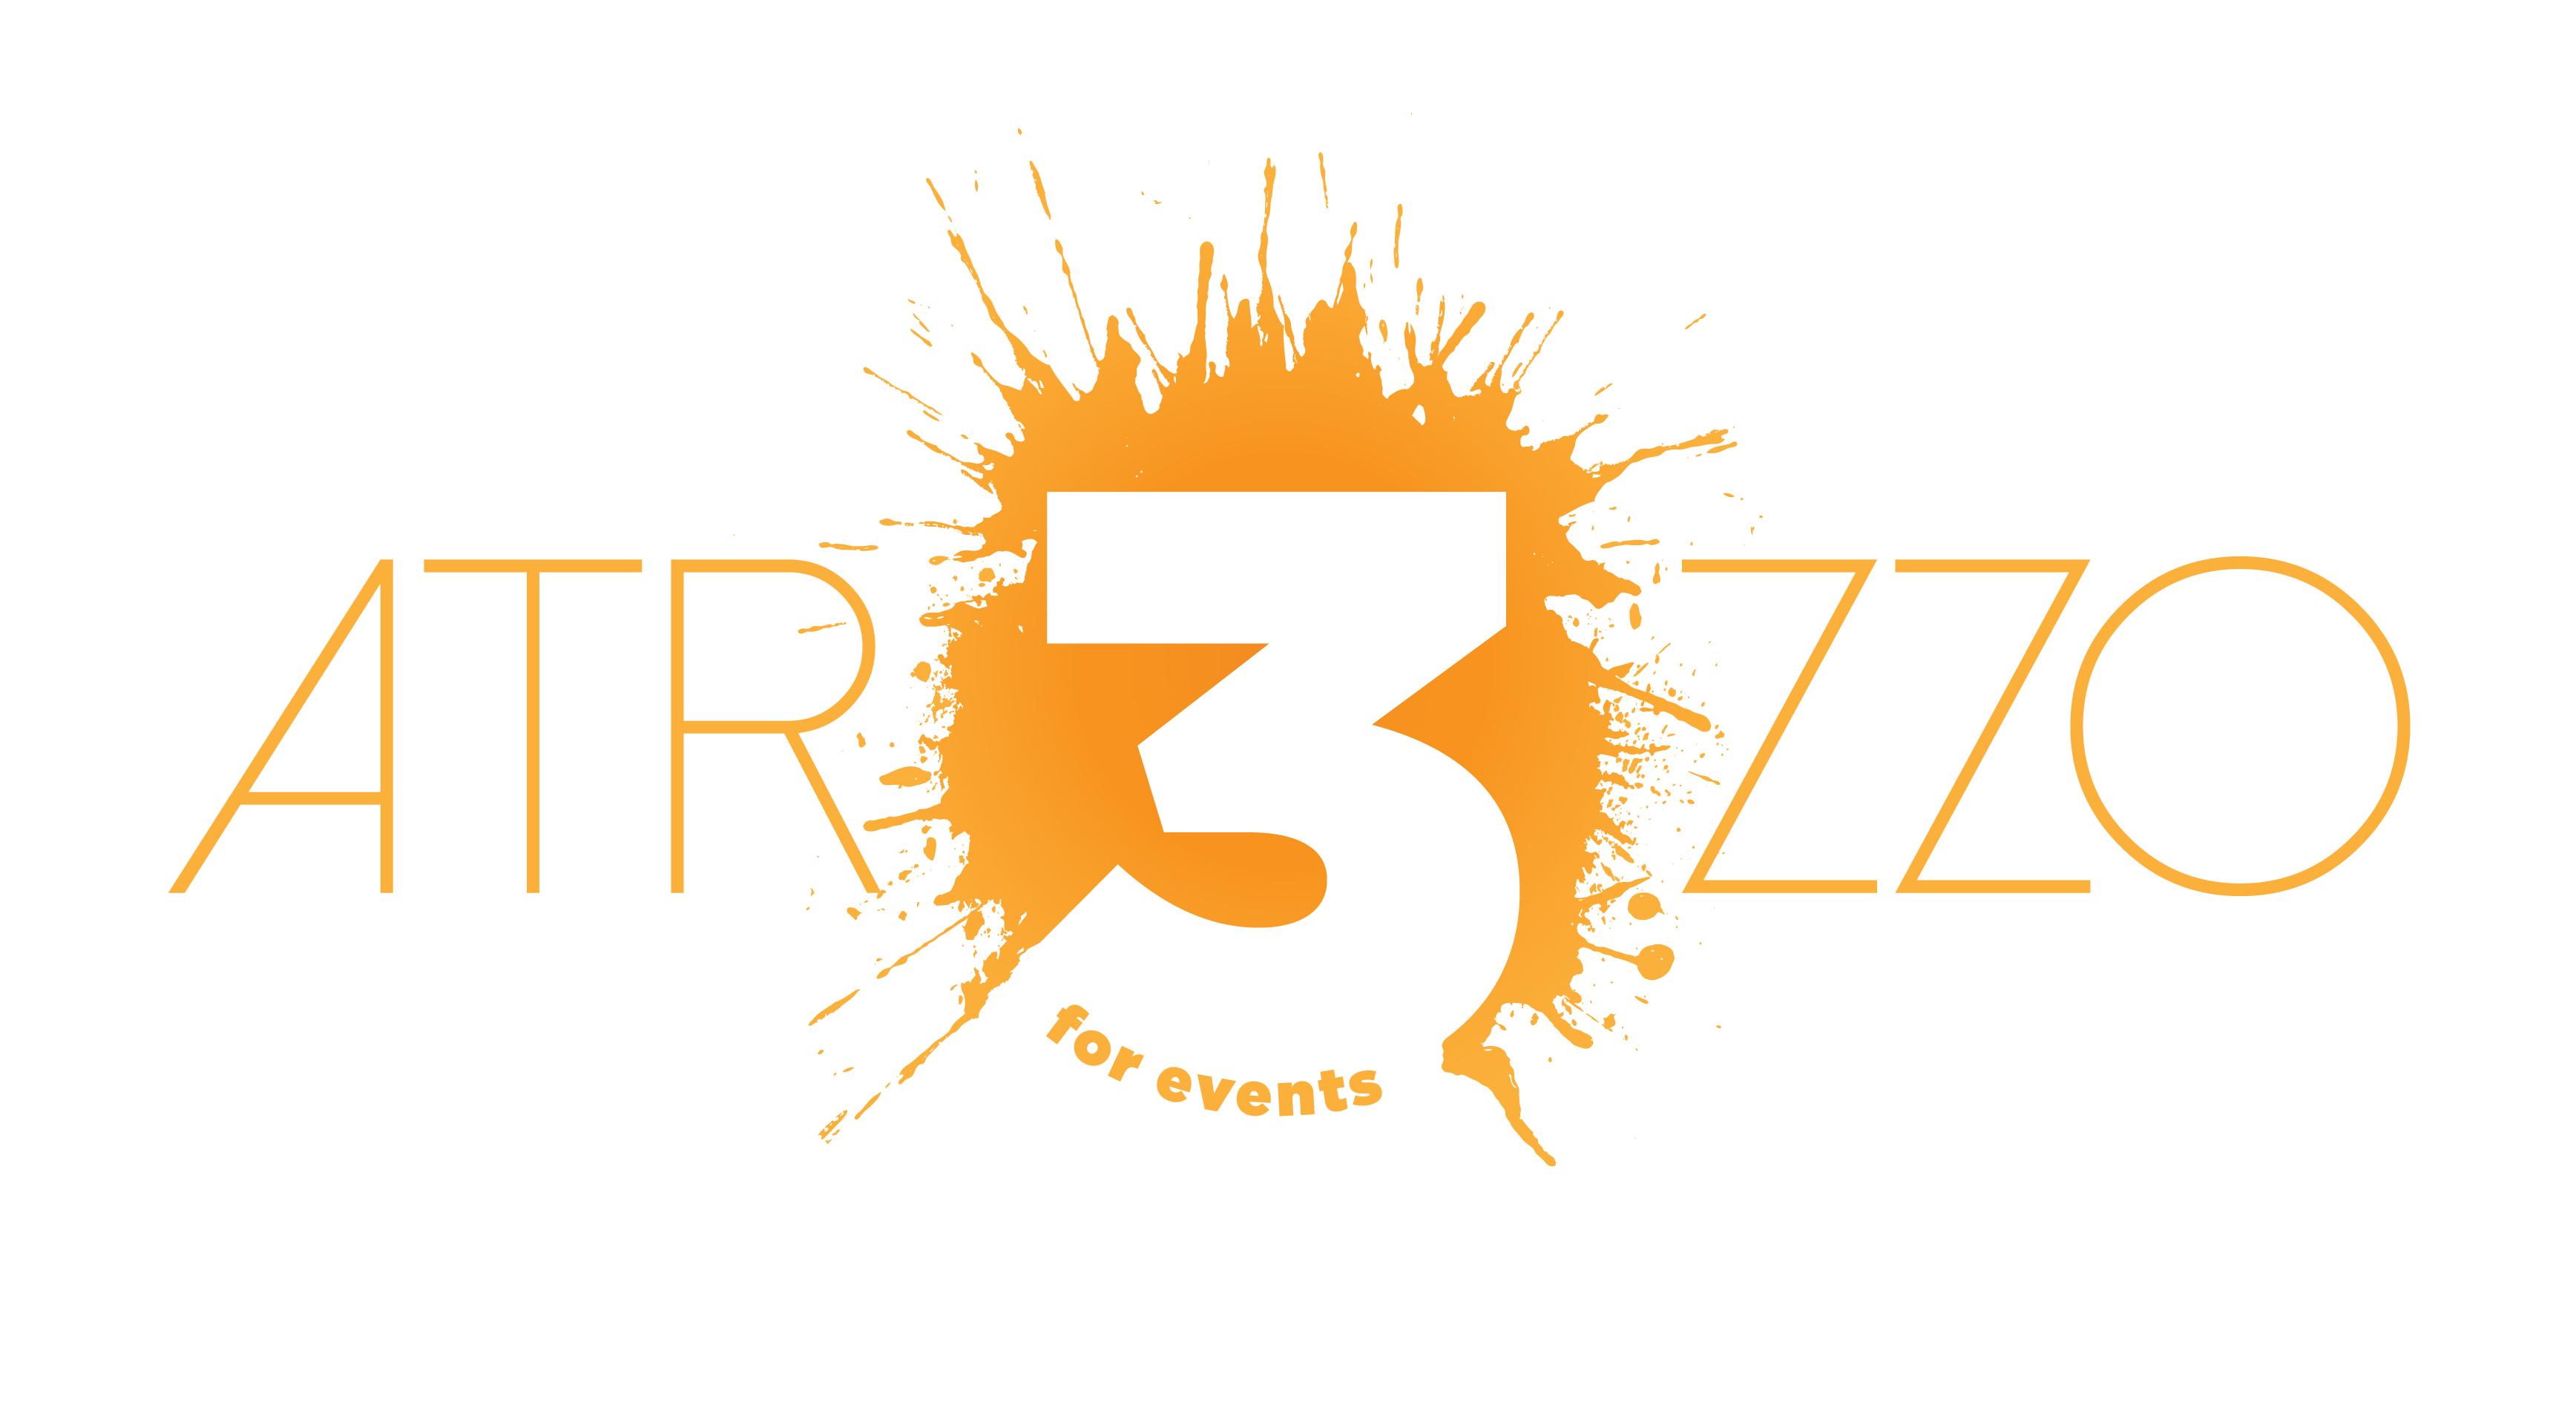 ATR3ZZO for events Logo